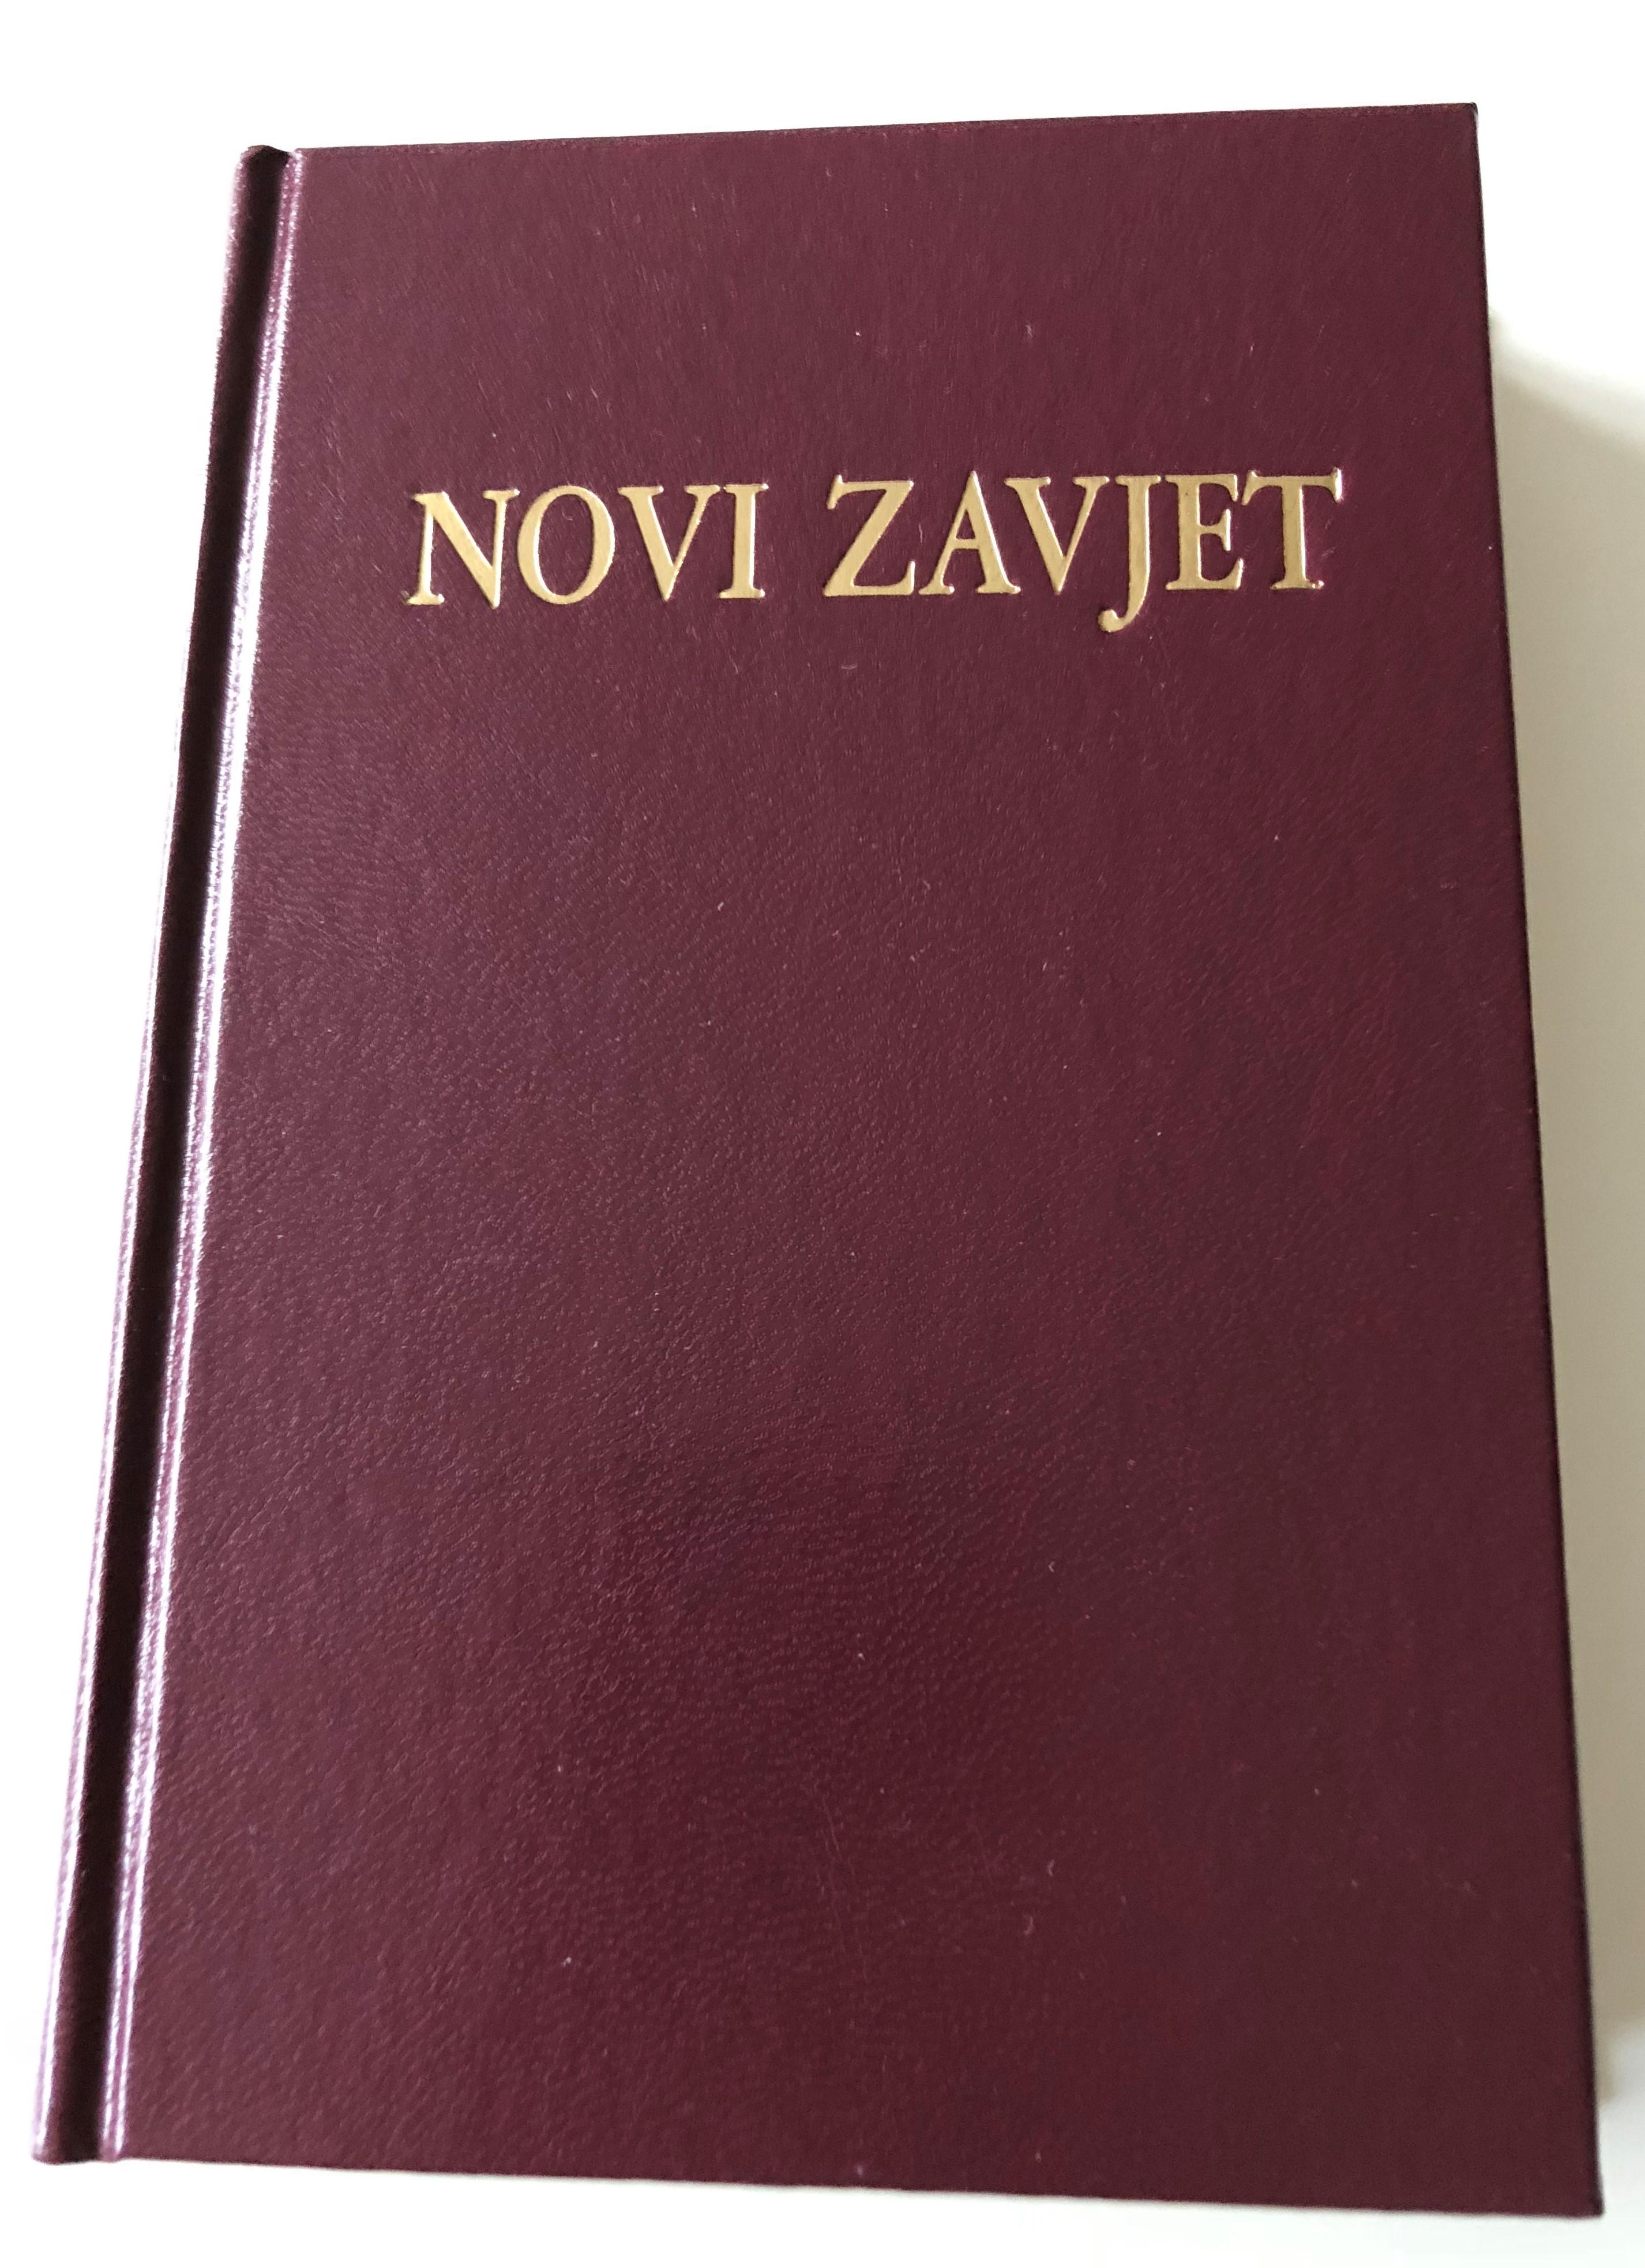 novi-zavjet-the-new-testament-in-croatian-language-hardcover-burgundy-hbd-2013-1-.jpg